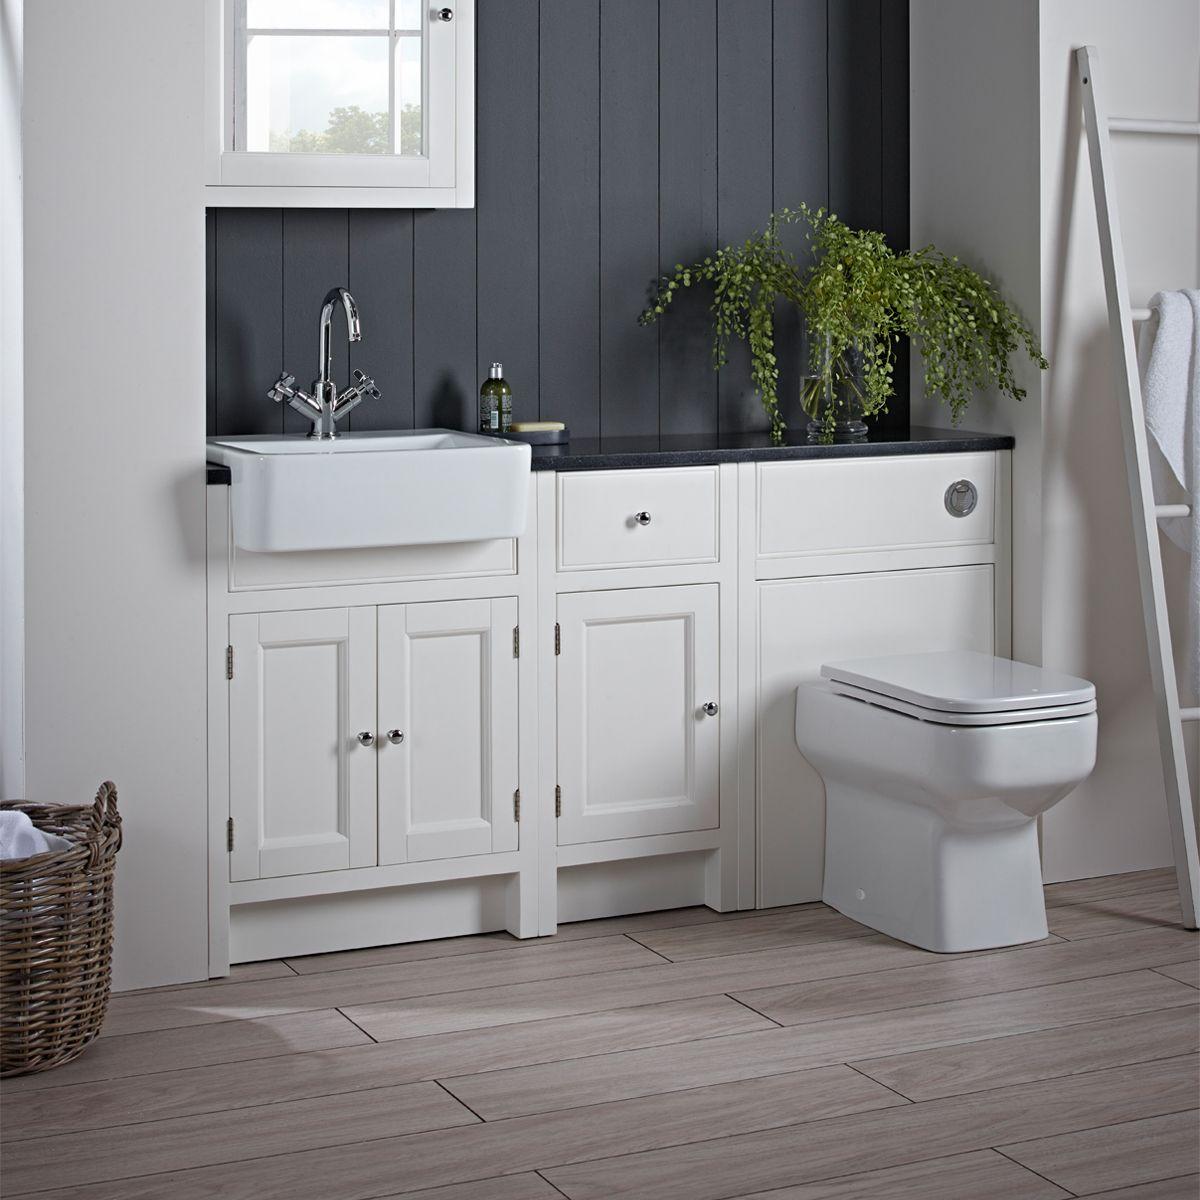 Roper Rhodes Hampton Chalk White Bathroom Storage Units Bathroom Furniture Fitted Bathroom